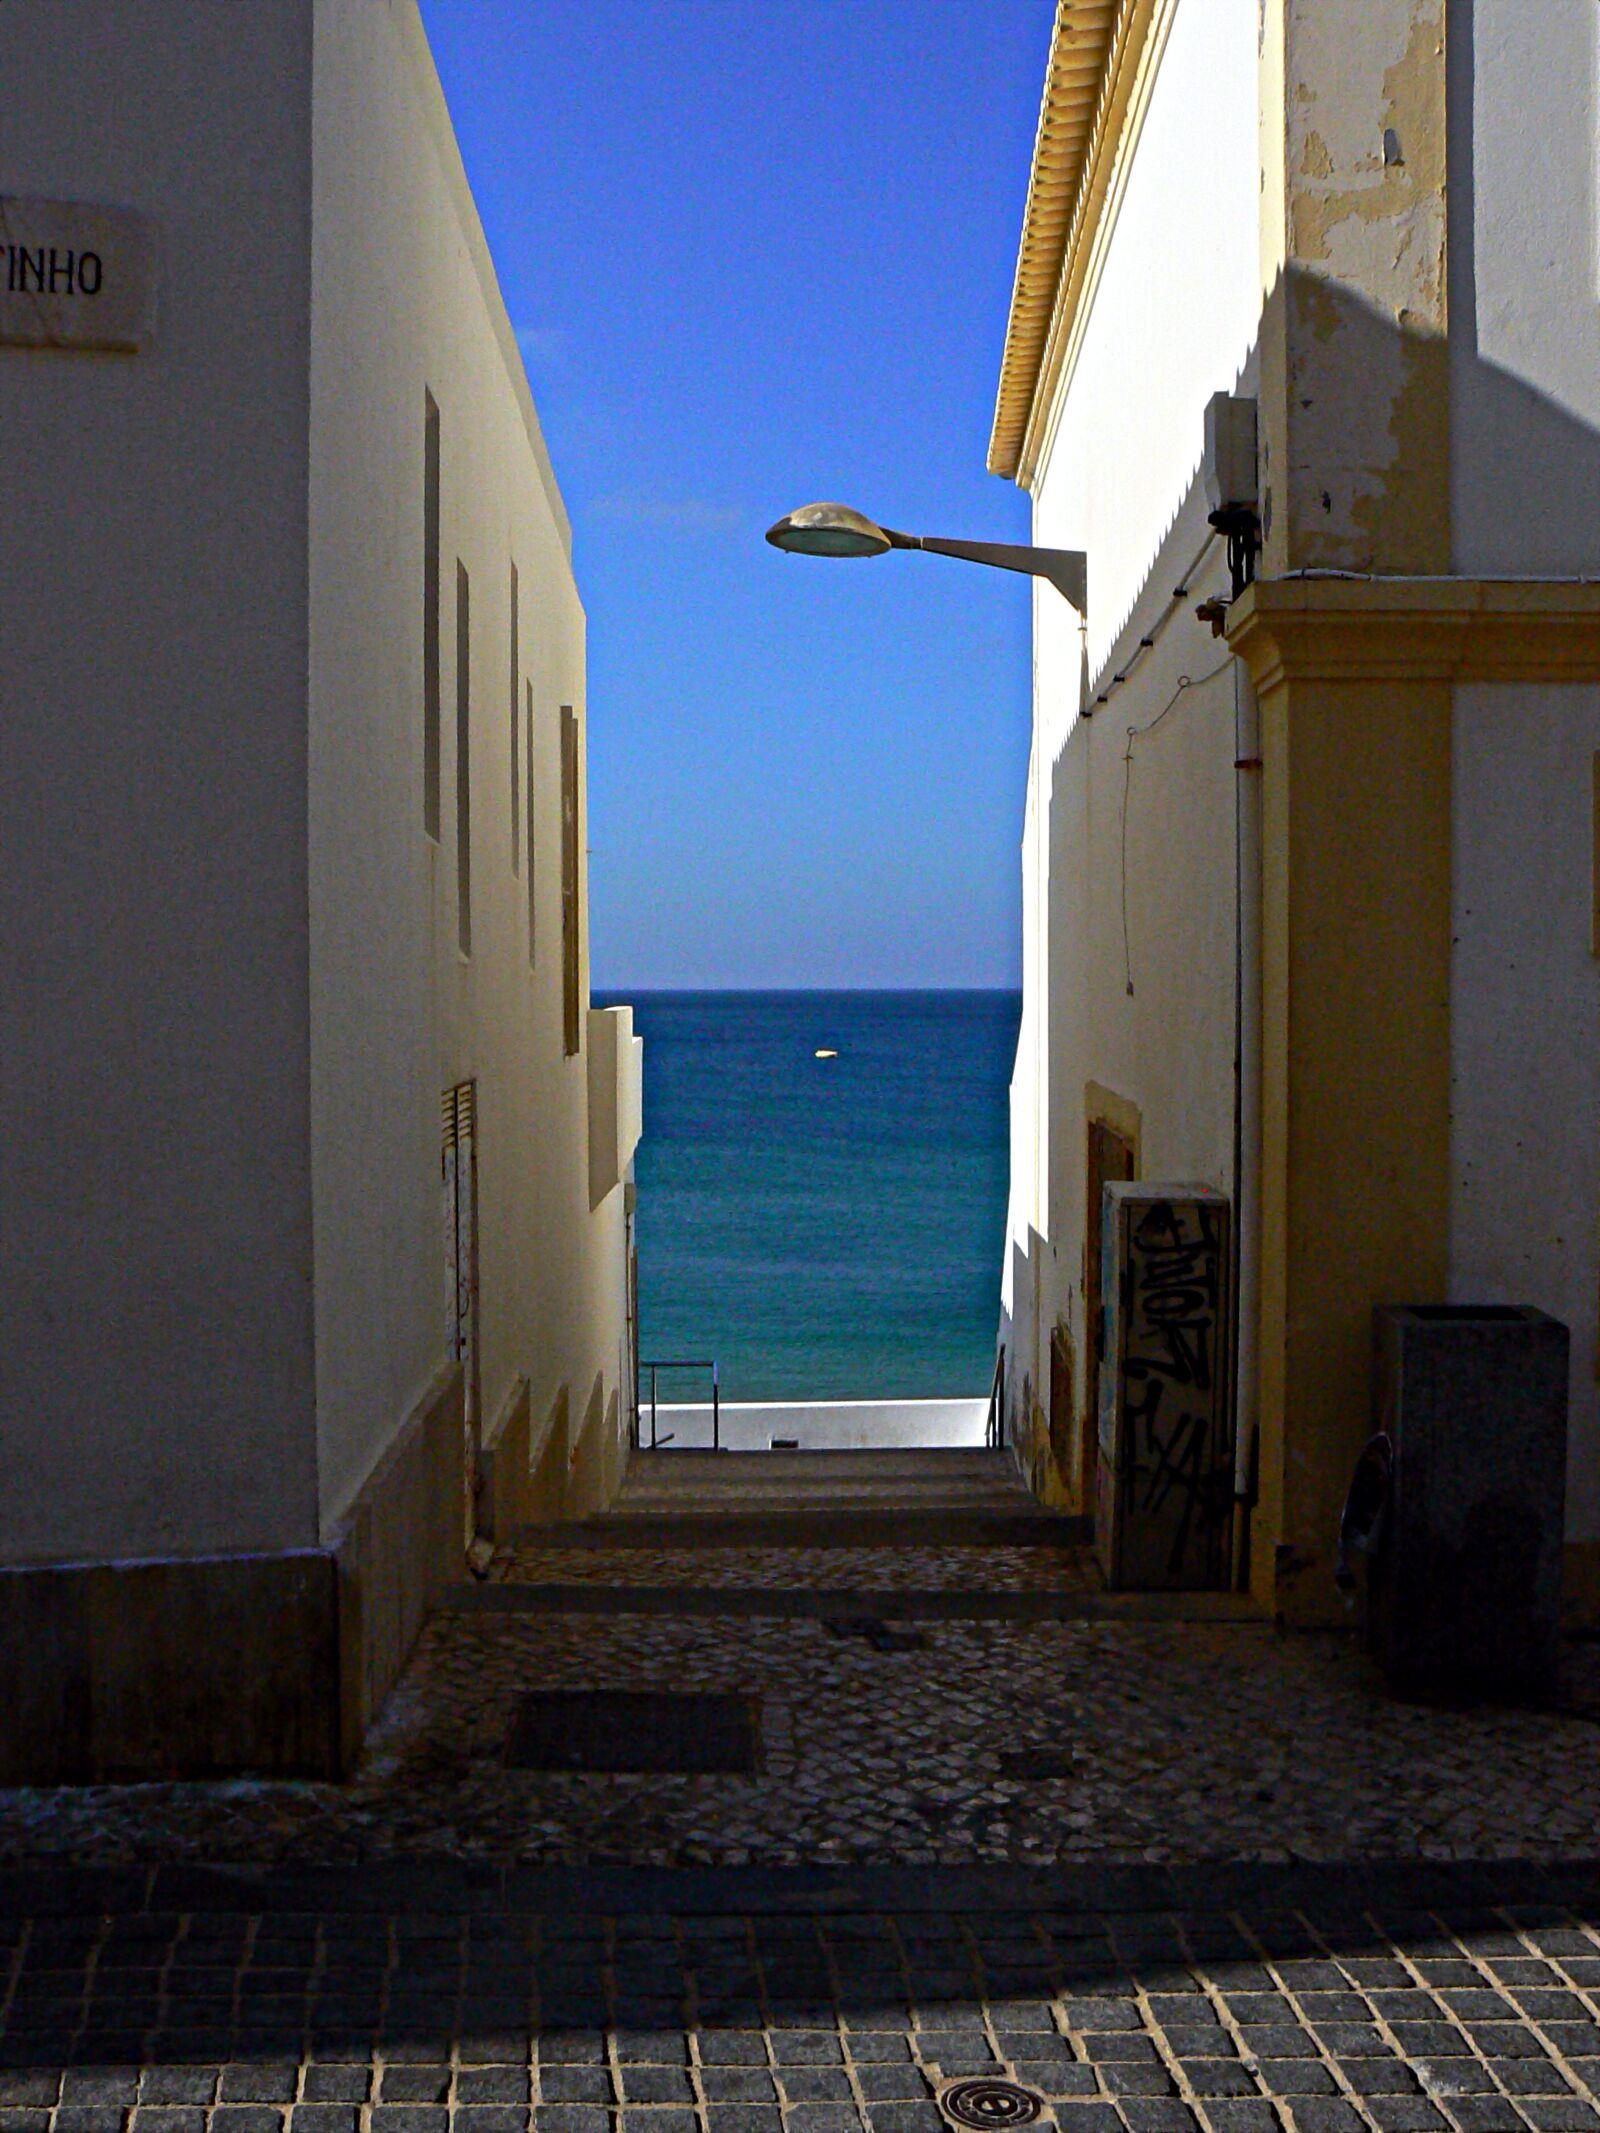 "Panasonic DMC-FZ7 sample photo. ""Sea, lane, perspective"" photography"